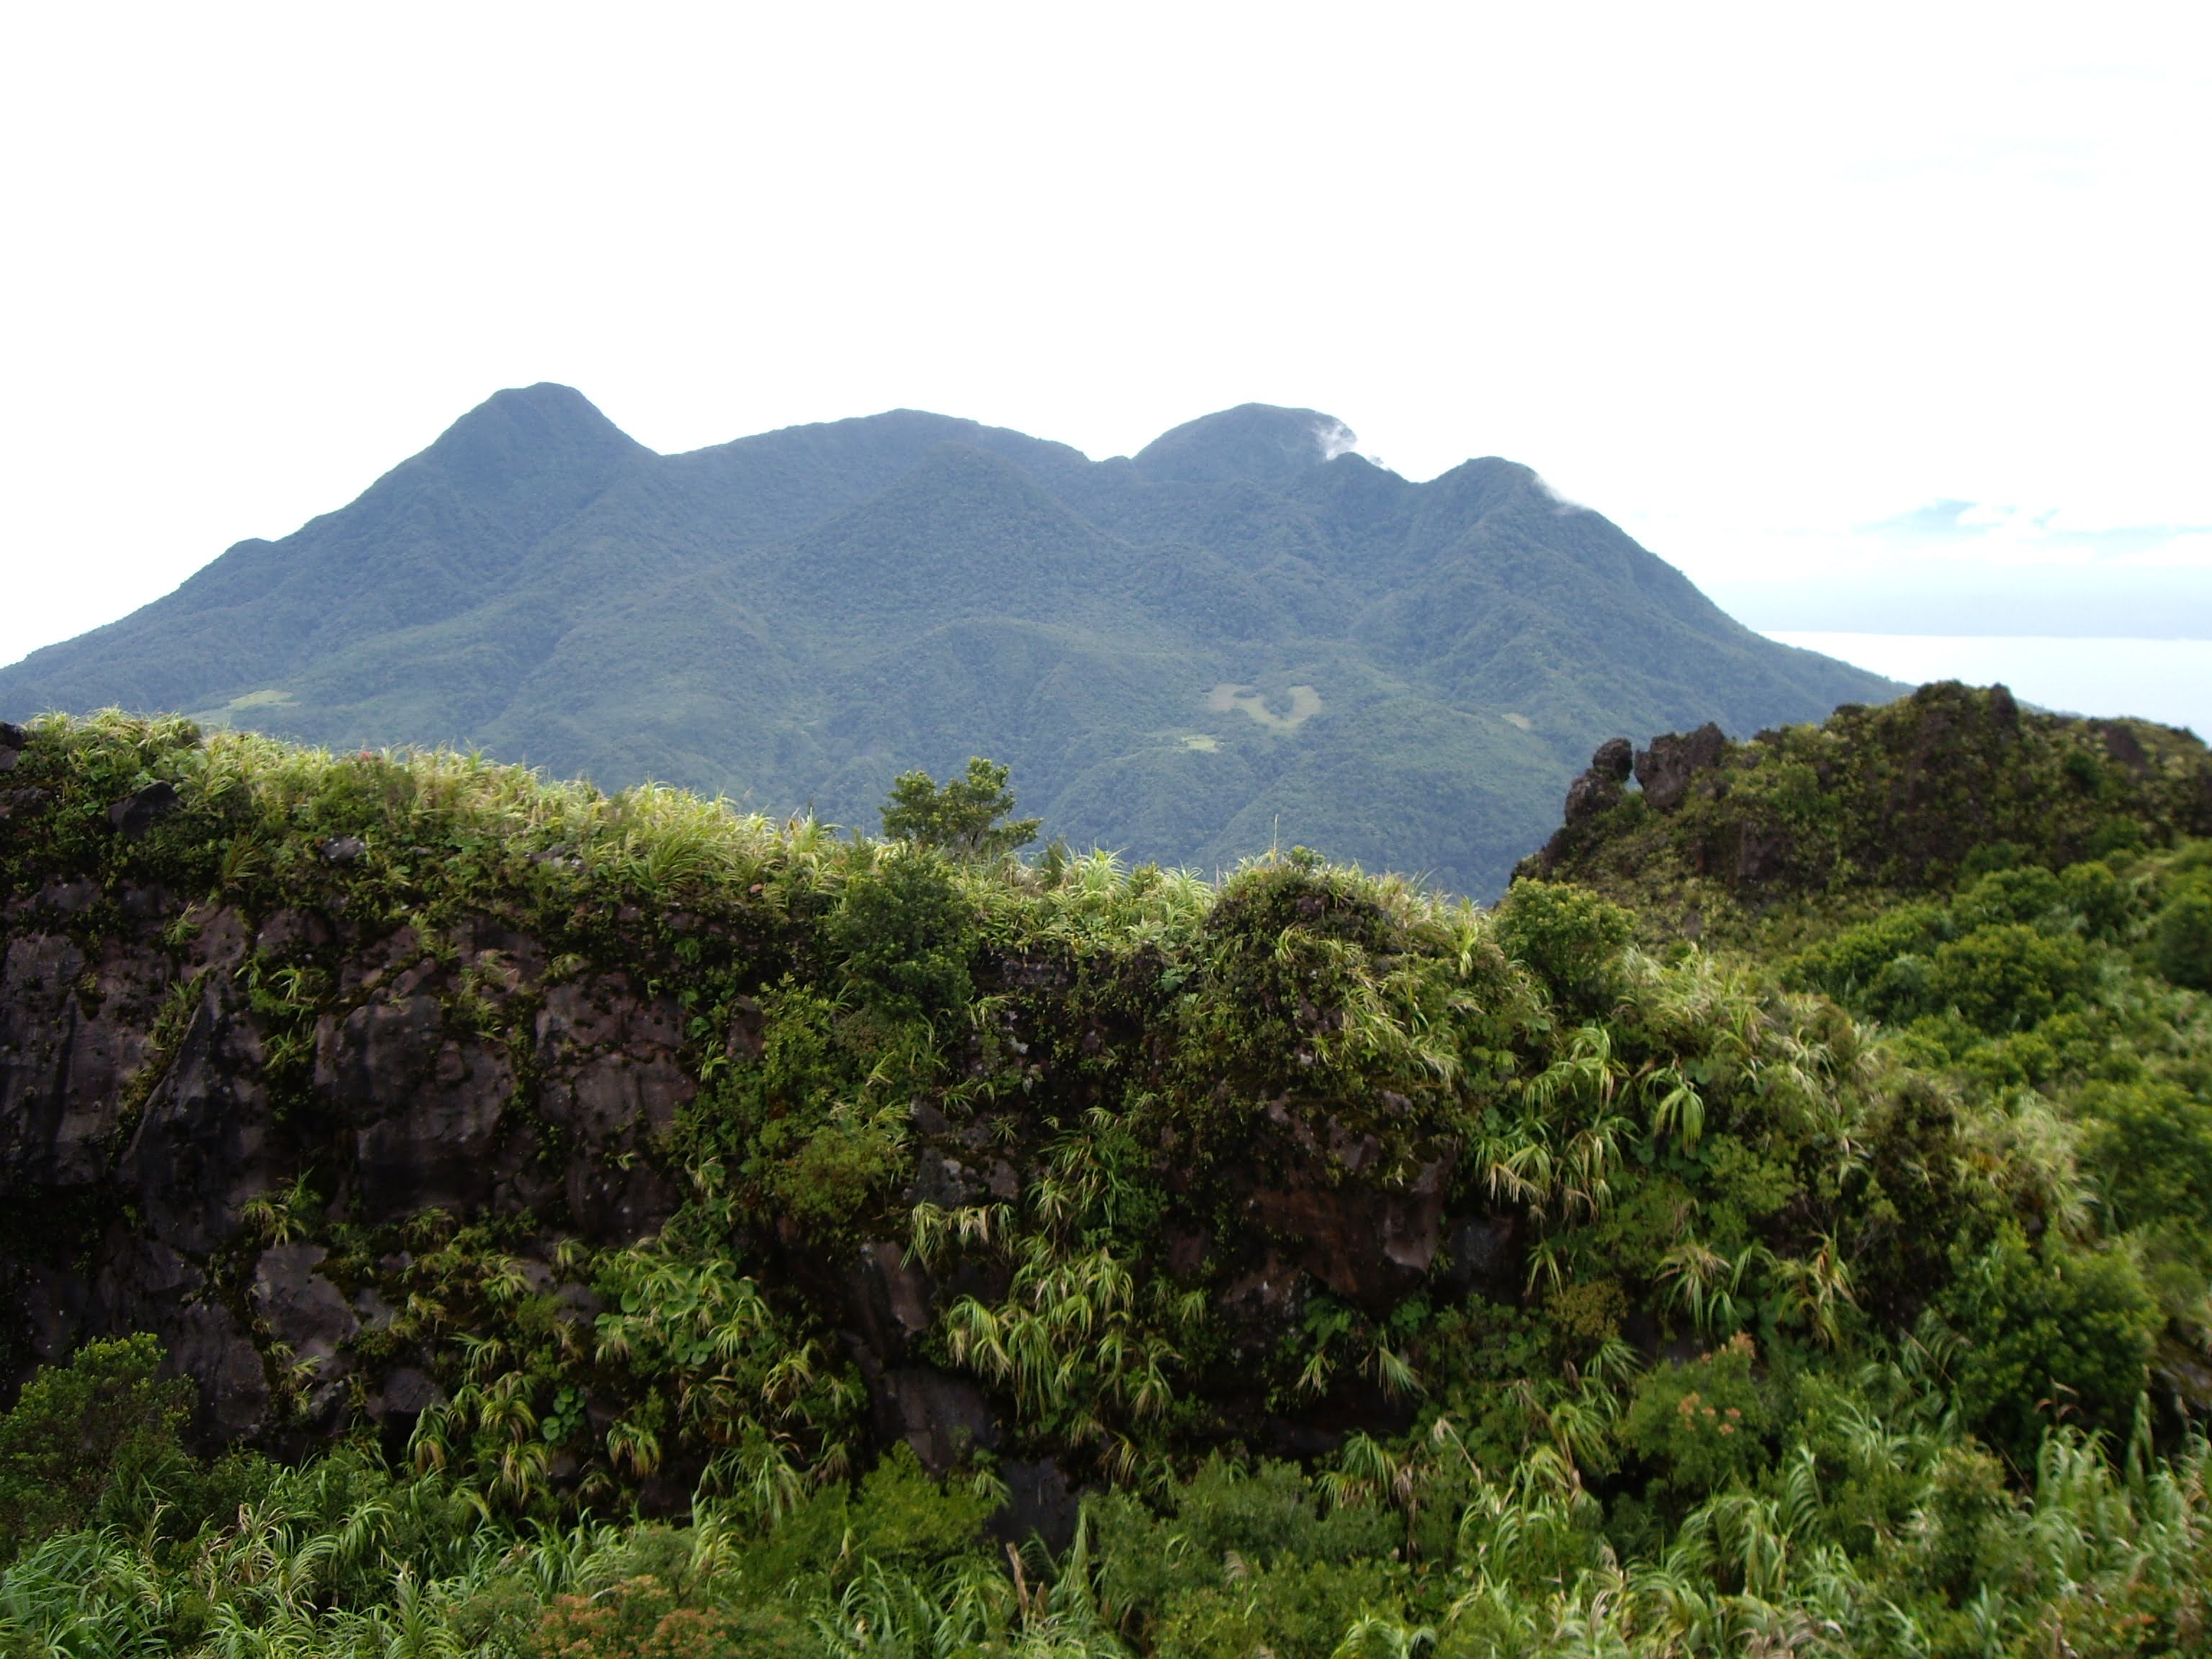 On the top of Mount Hibok-Hibok, Camiguin Island.